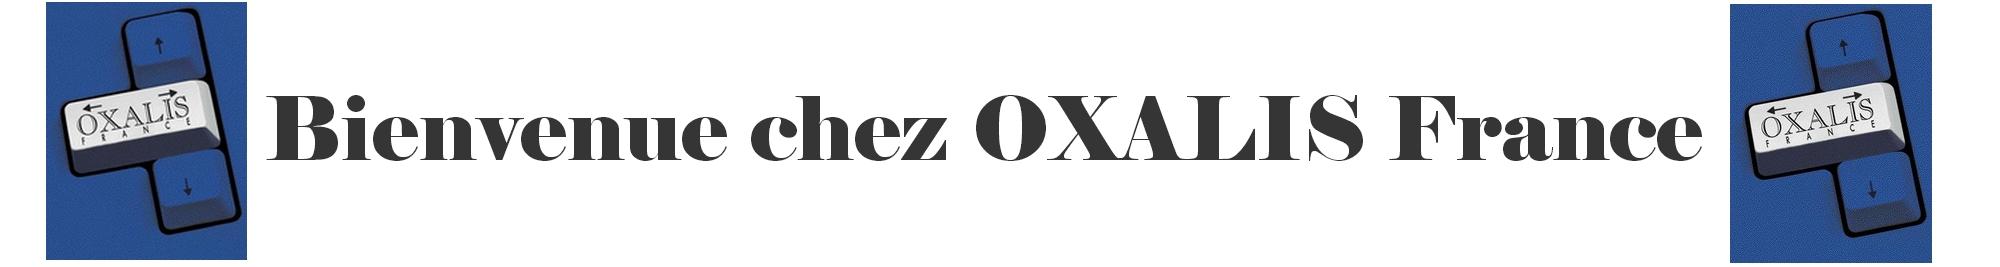 OXALIS FRANCE Logo